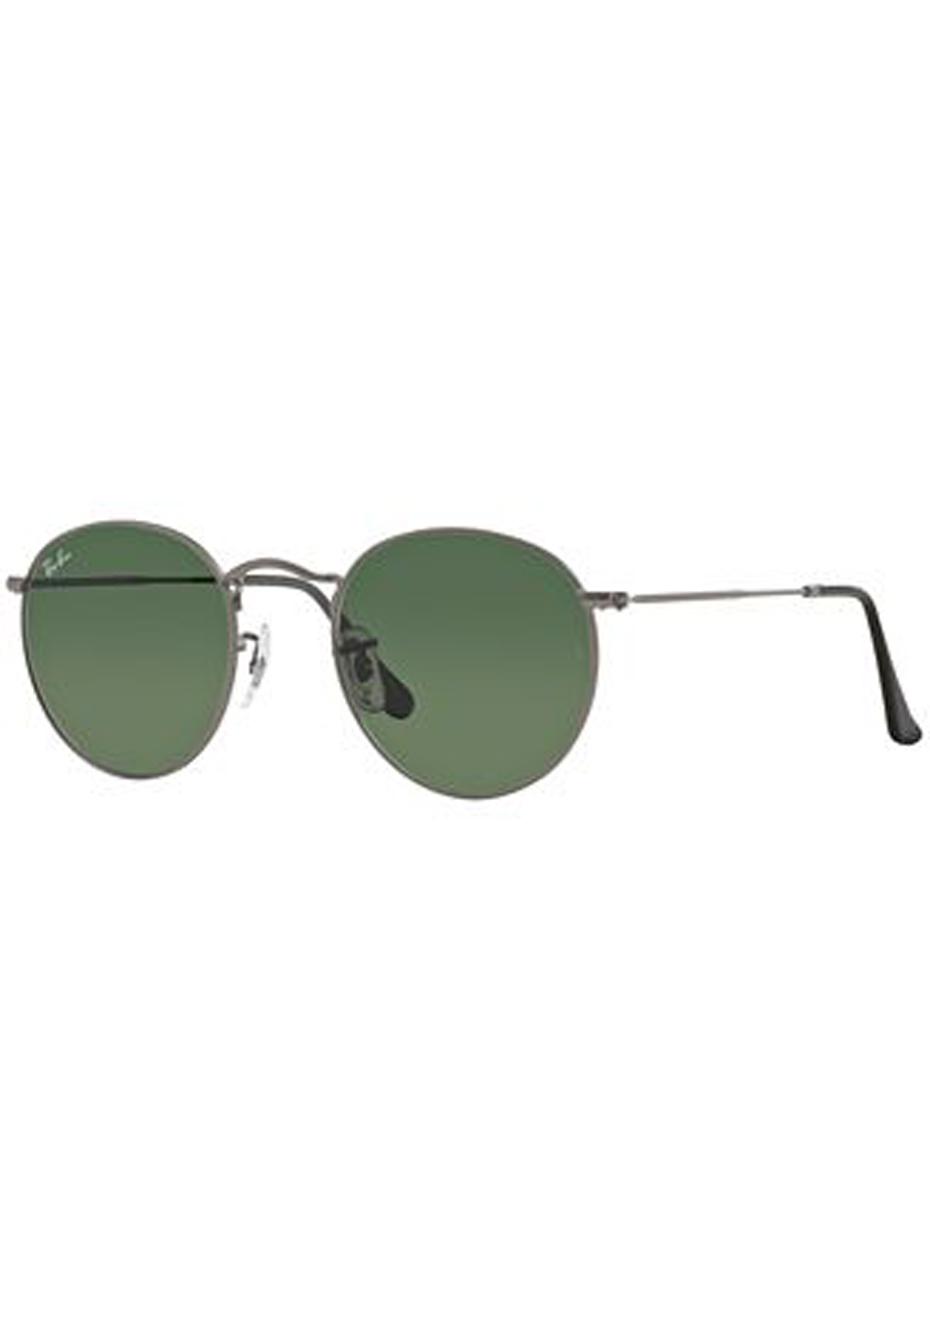 a564a5d82b ... wholesale ray ban round metal sunglasses gunmetal free shipping  jewellery sunglasses onceit 76b9e 9dc22